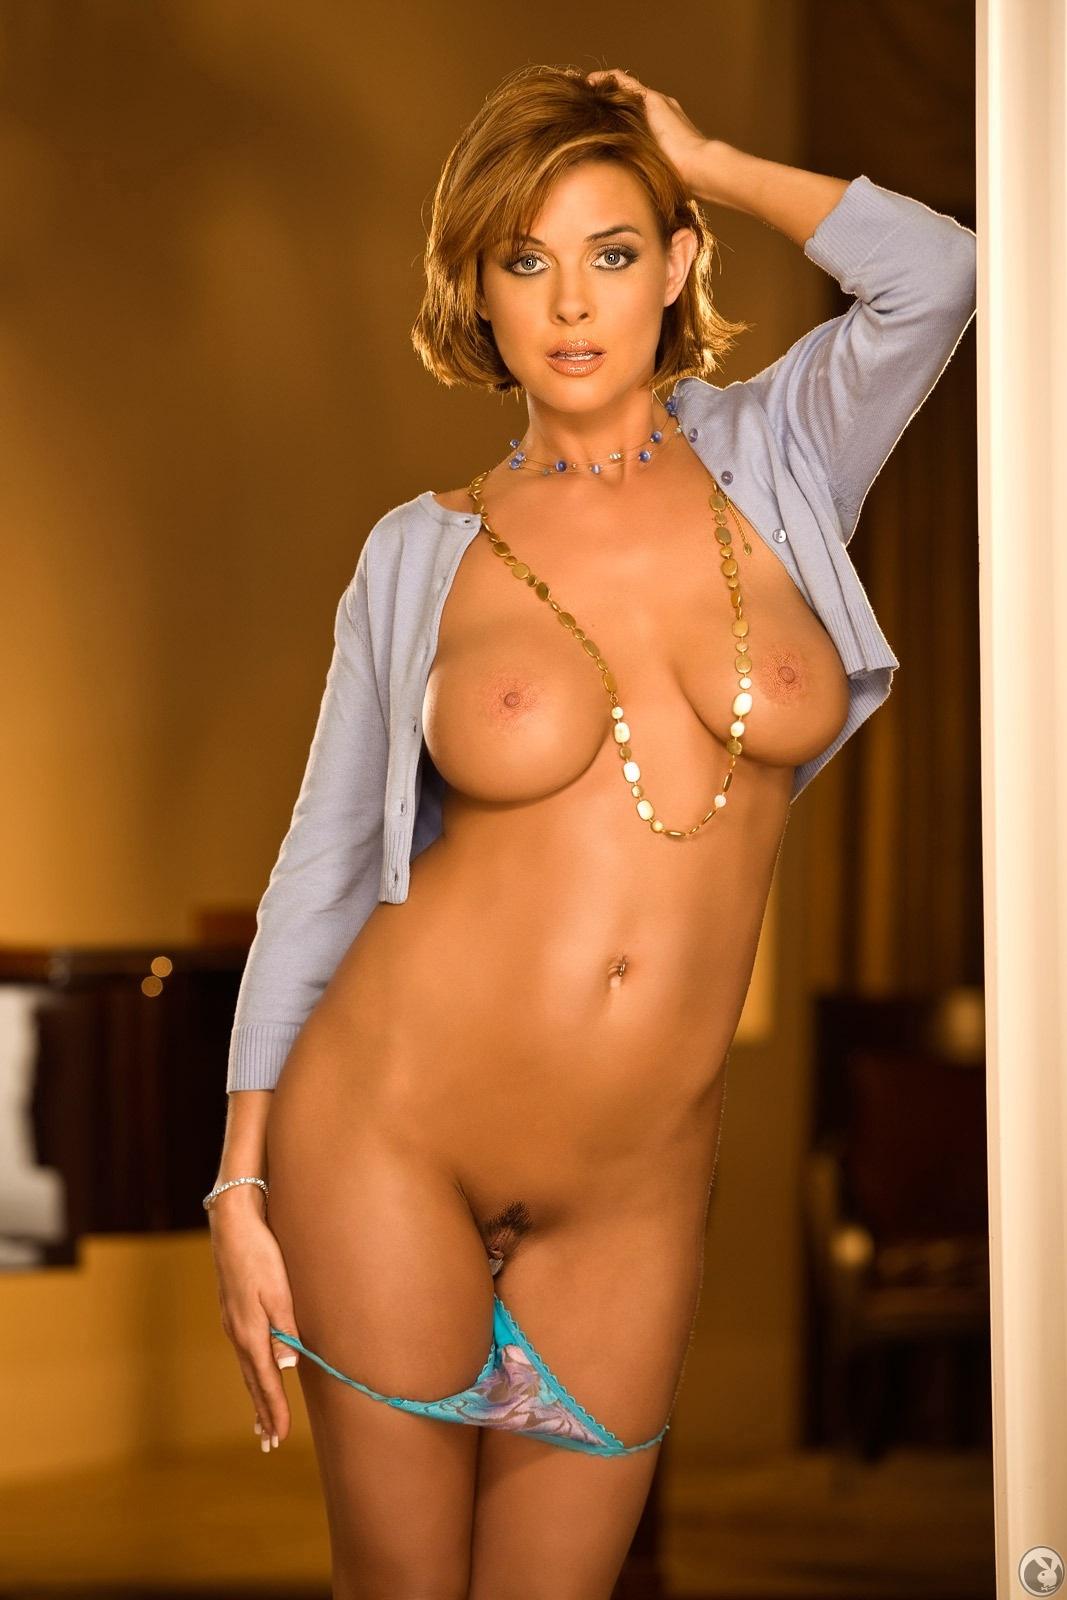 fat curvy wide hip naked women